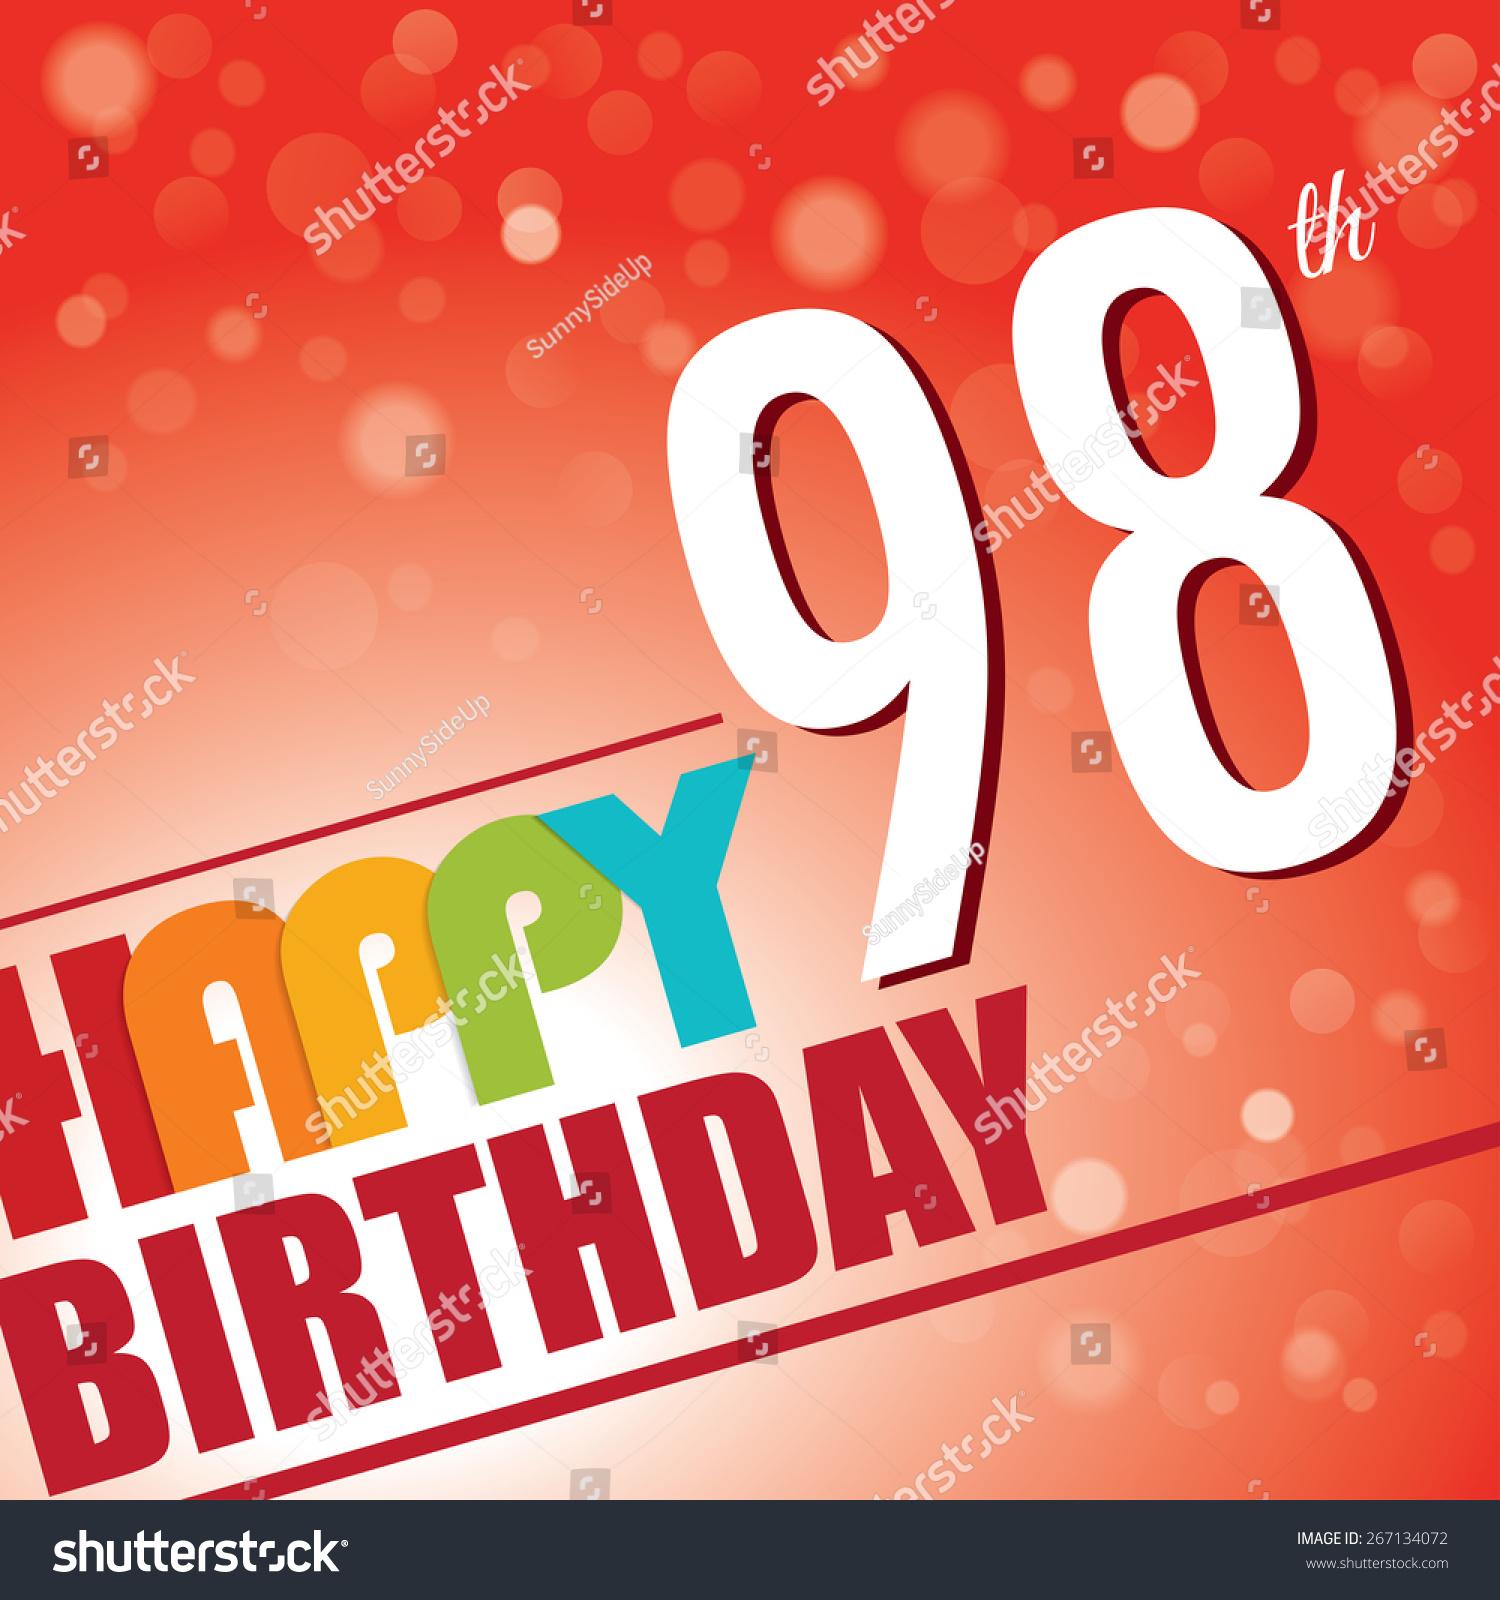 98th Birthday Party Invitetemplate Design Bright Stock Vector